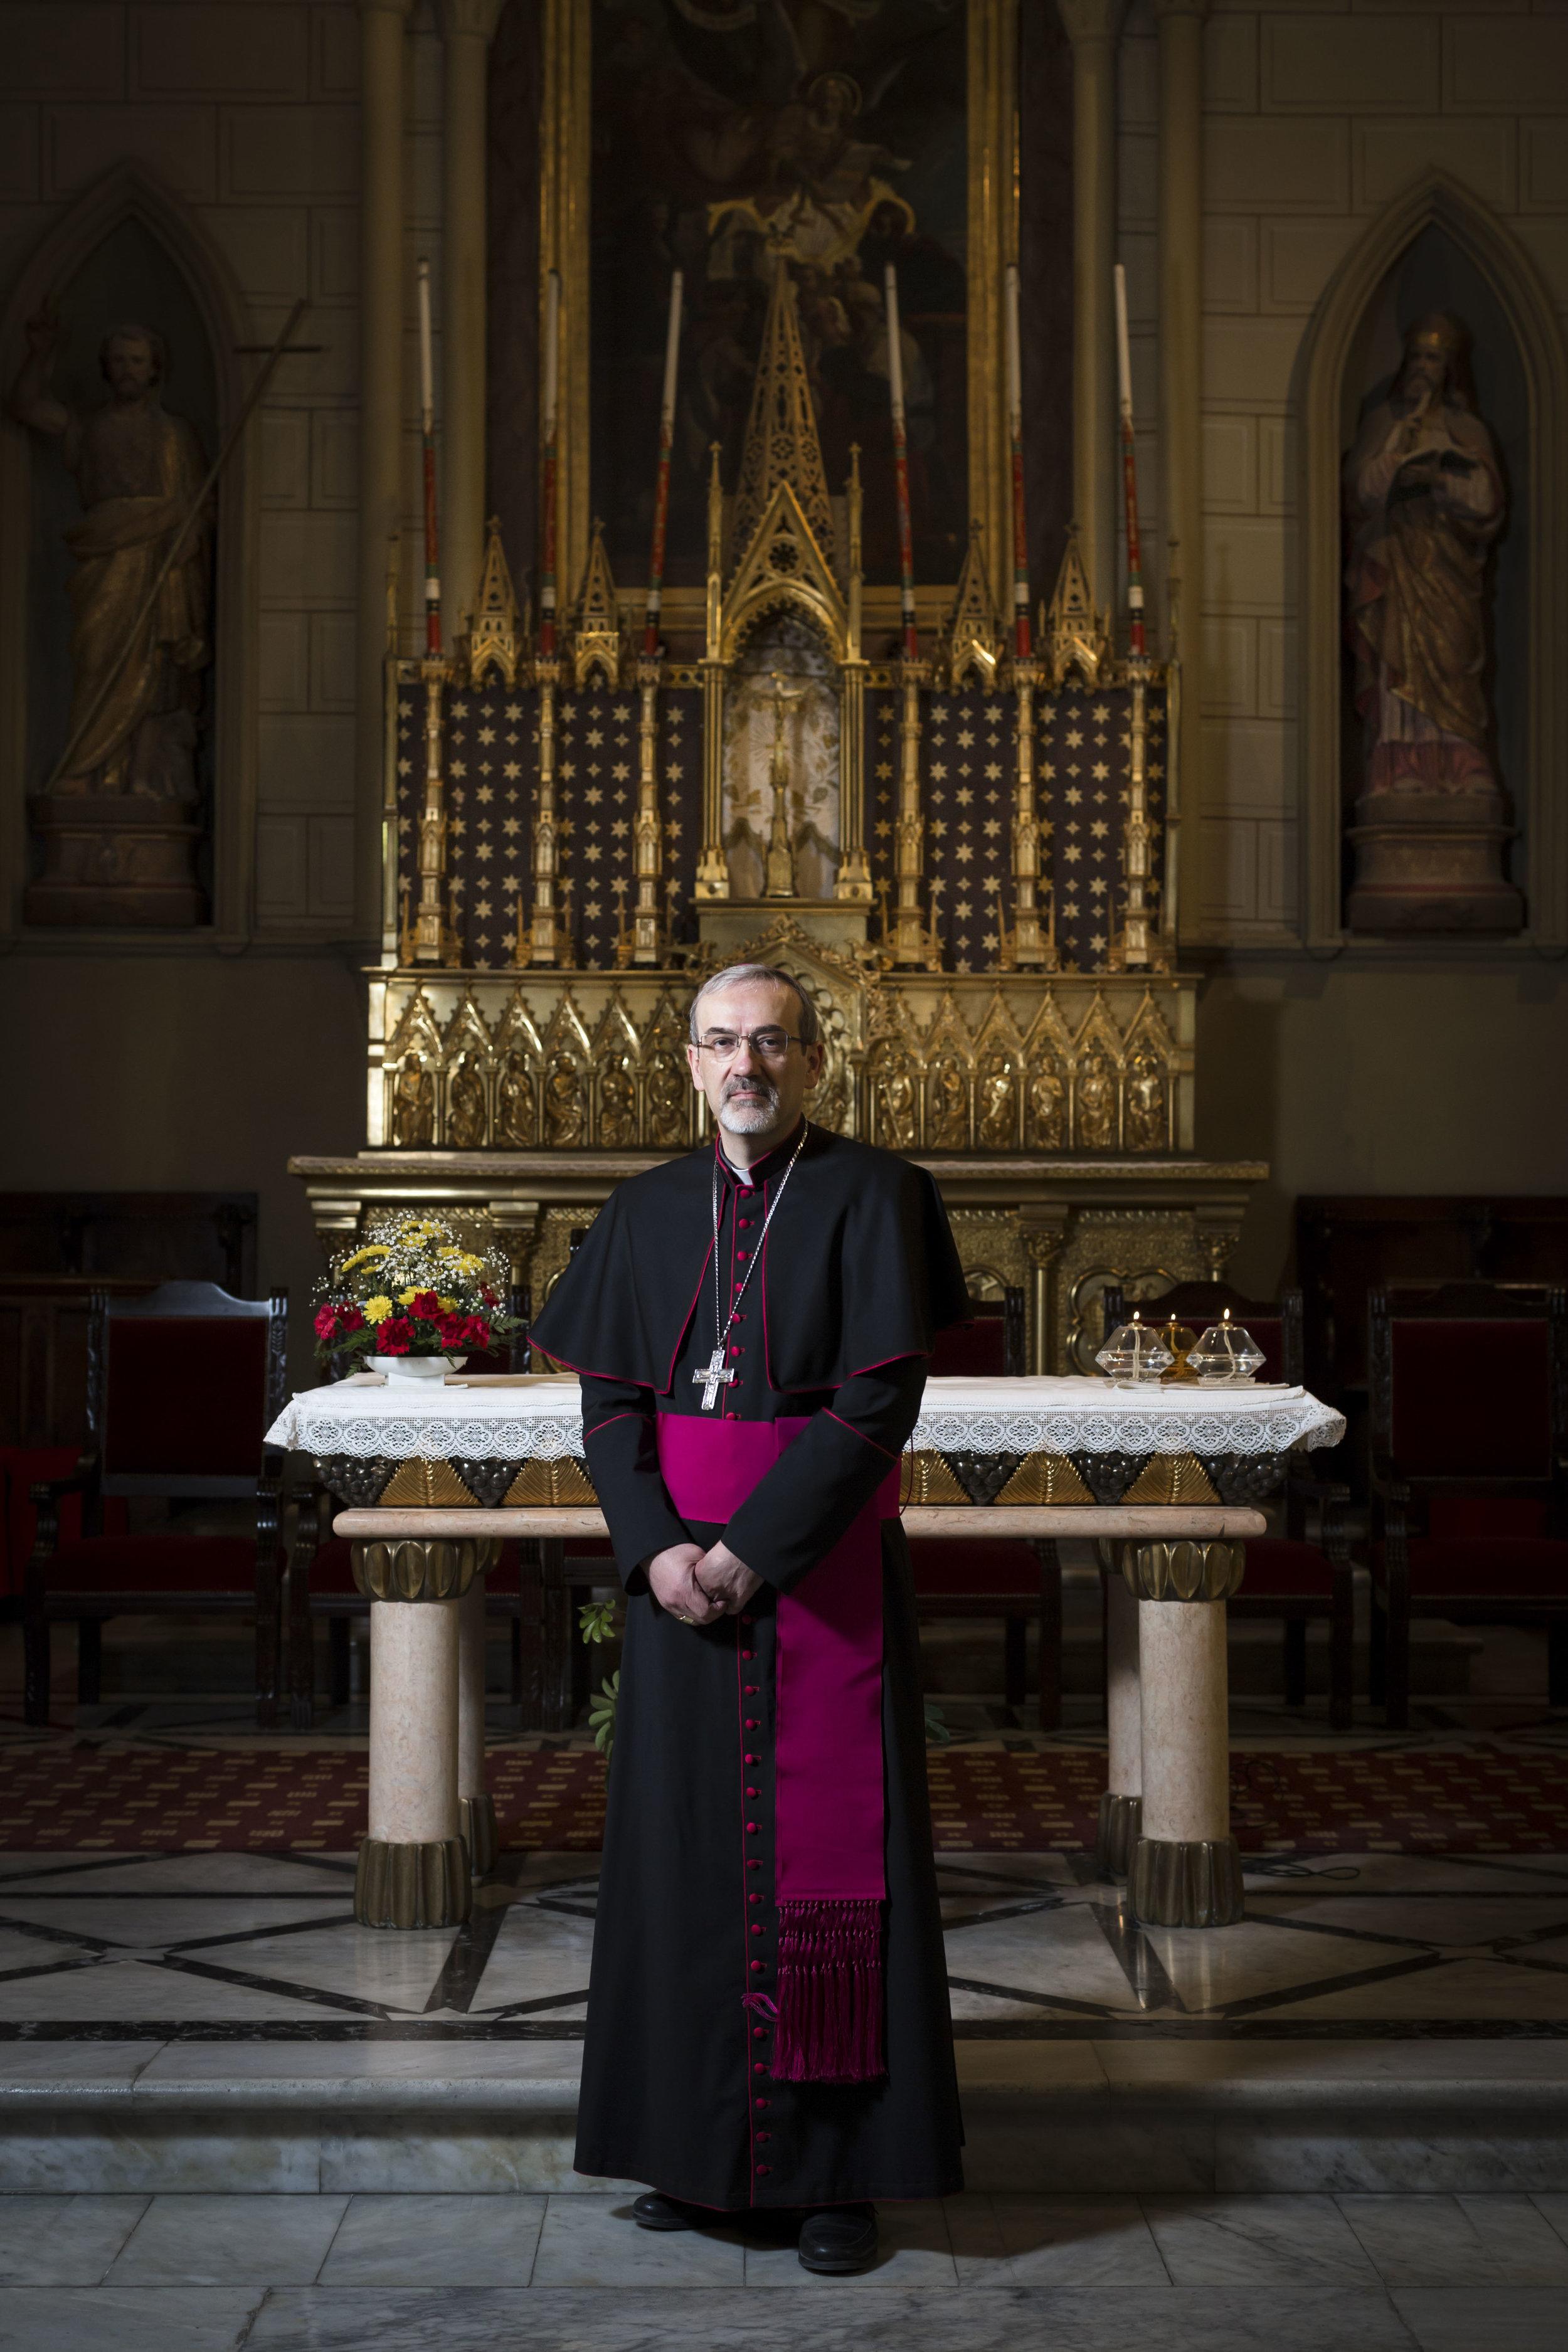 Portrait of the Most Rev. Pierbattista Pizzaballa, Apostolic Administrator Latin Patriarchate of Jerusalem.